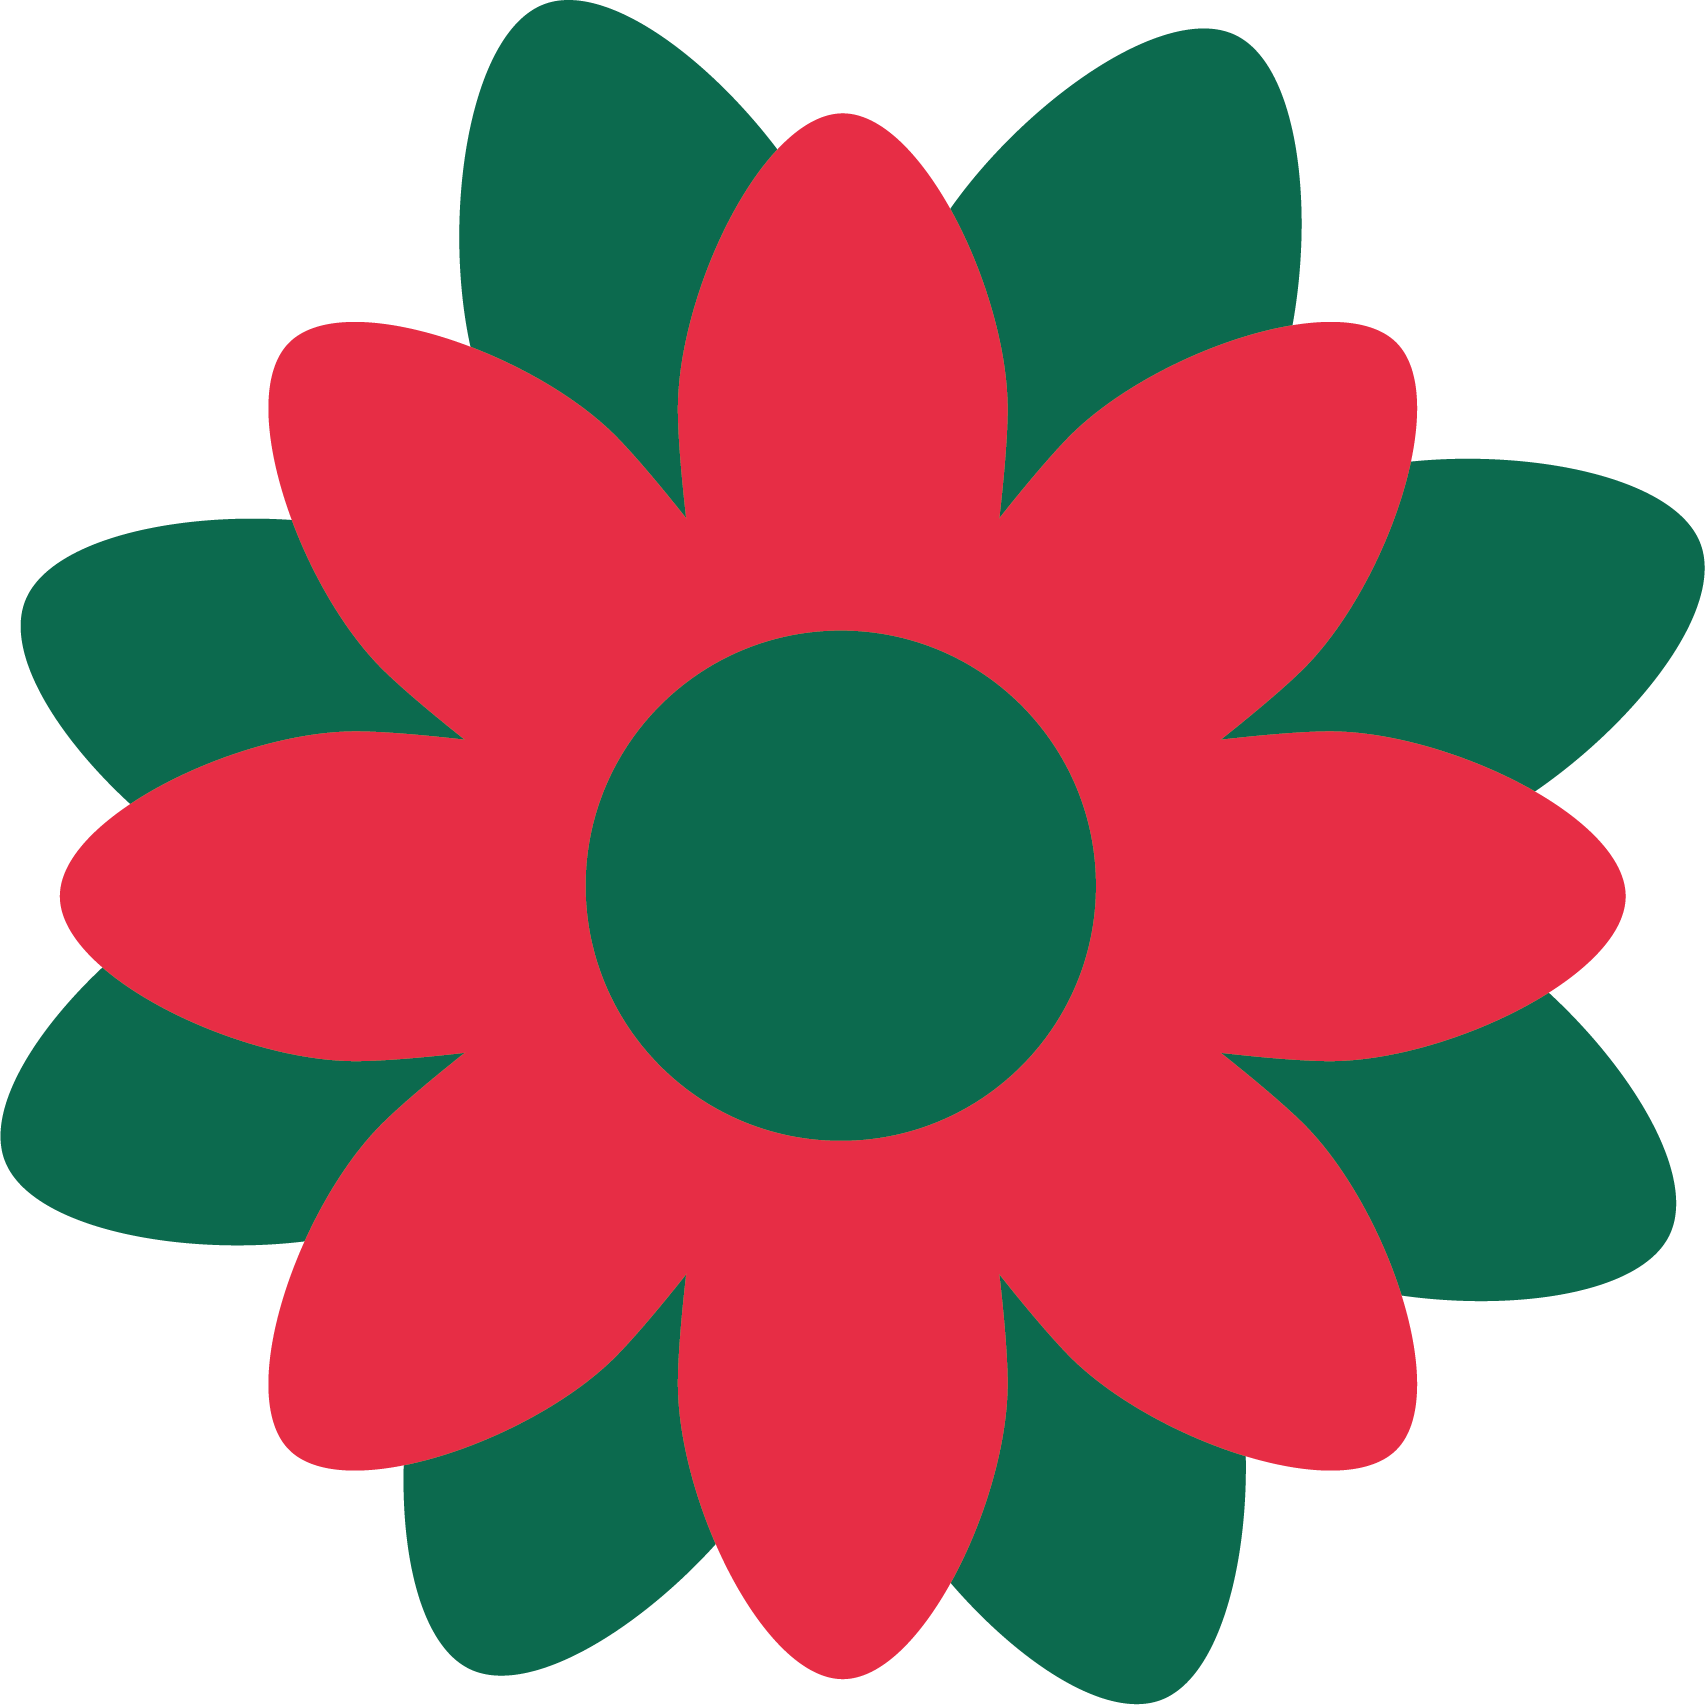 https://f.hubspotusercontent40.net/hubfs/4528298/giriphul-logo.png